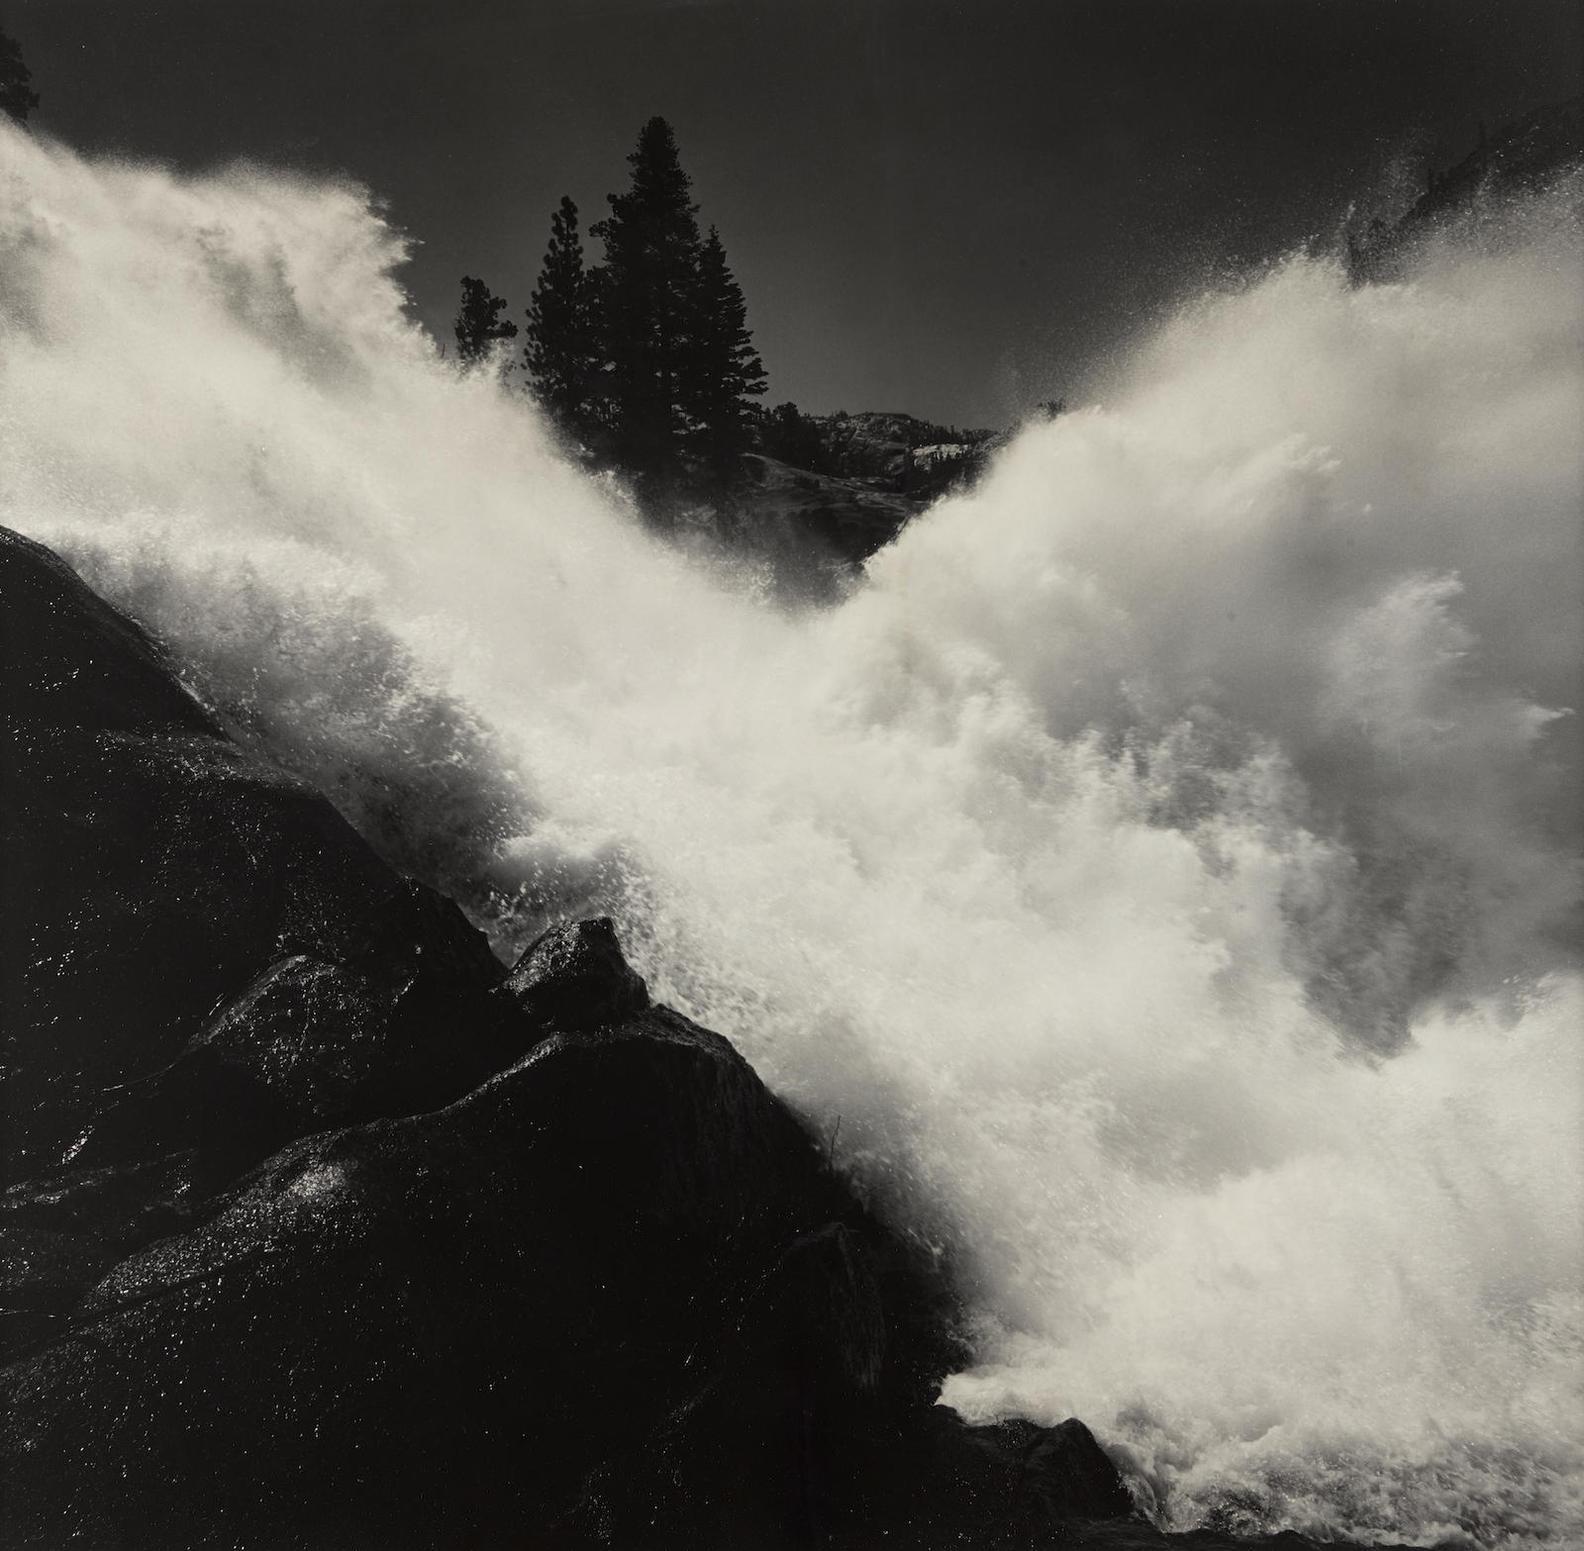 Ansel Adams-Waterwheel Falls, Yosemite National Park-1940